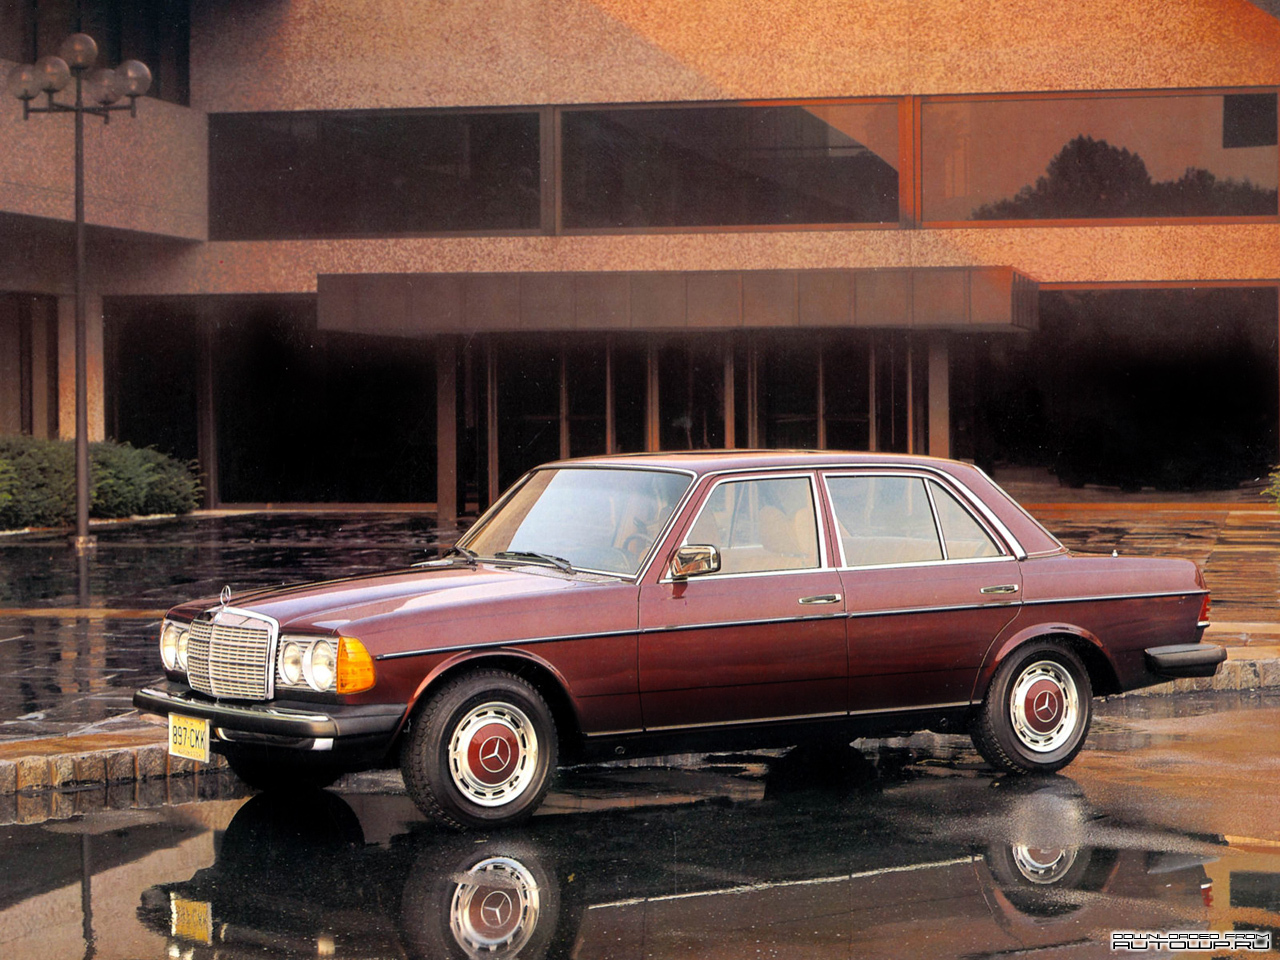 Mercedes-Benz E-Class W123 photo 76644